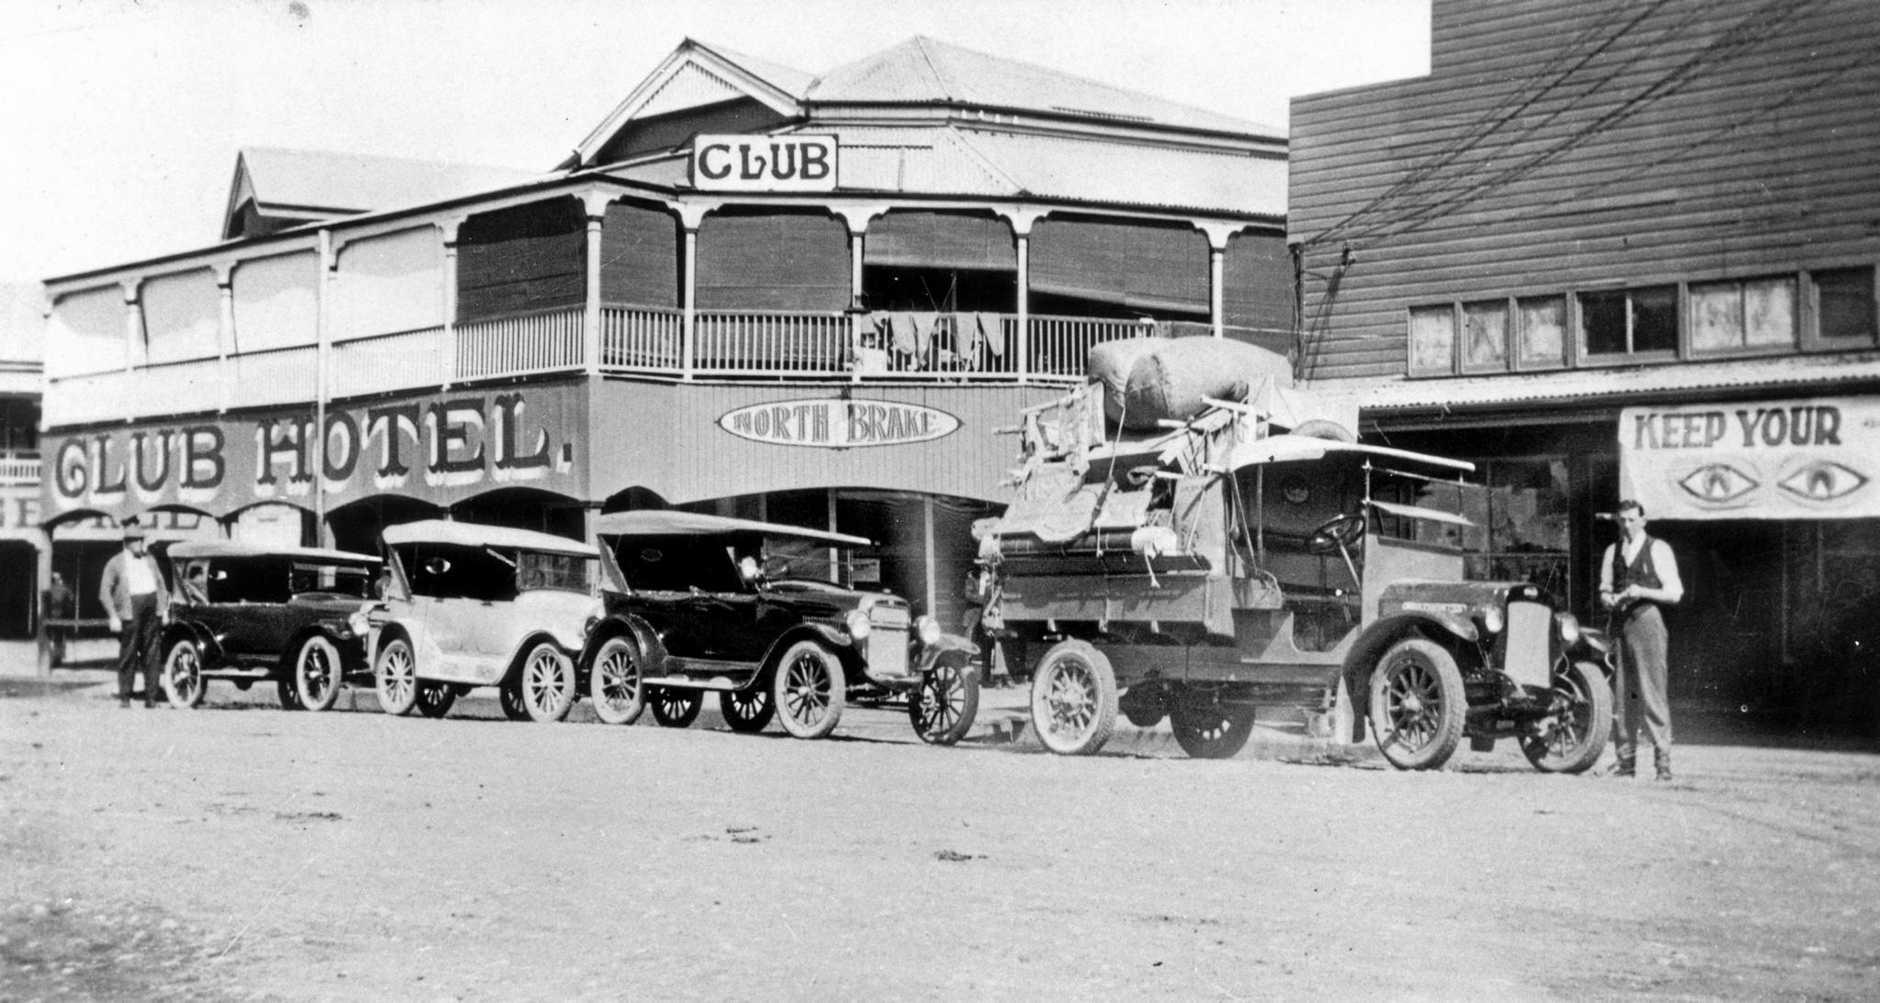 The Club Hotel, circa 1925.